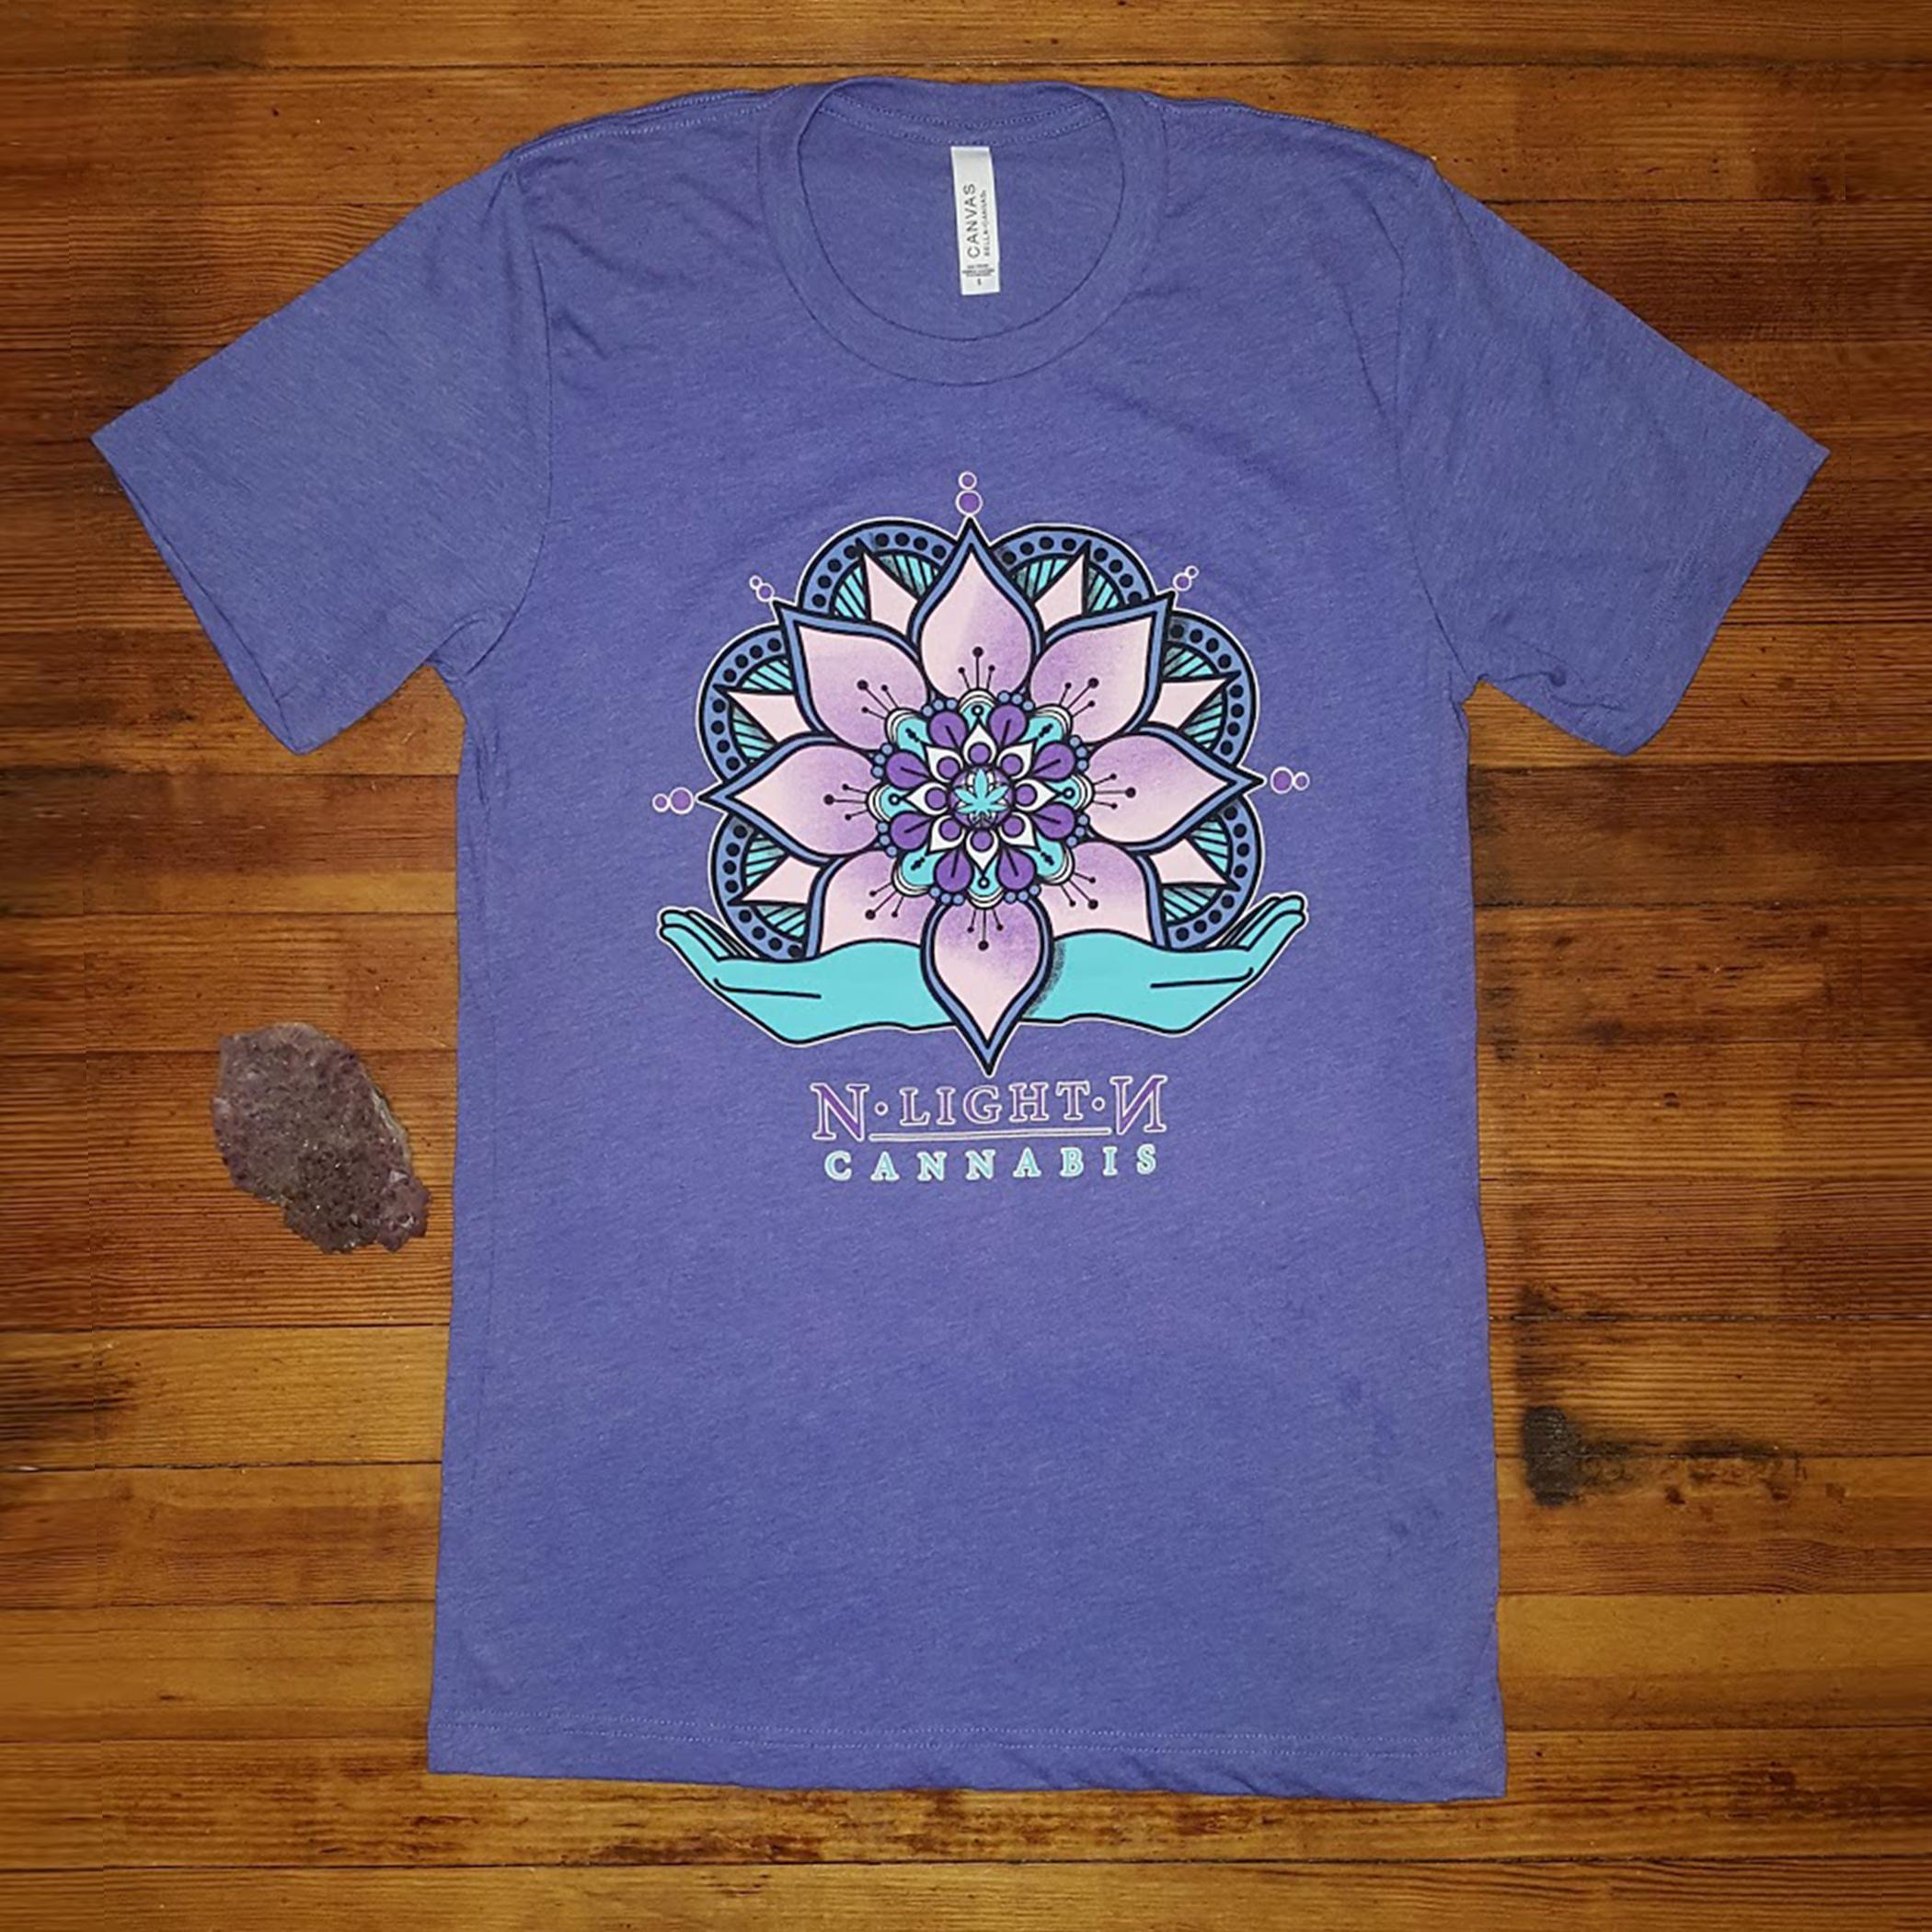 NLightN T Shirt.jpg